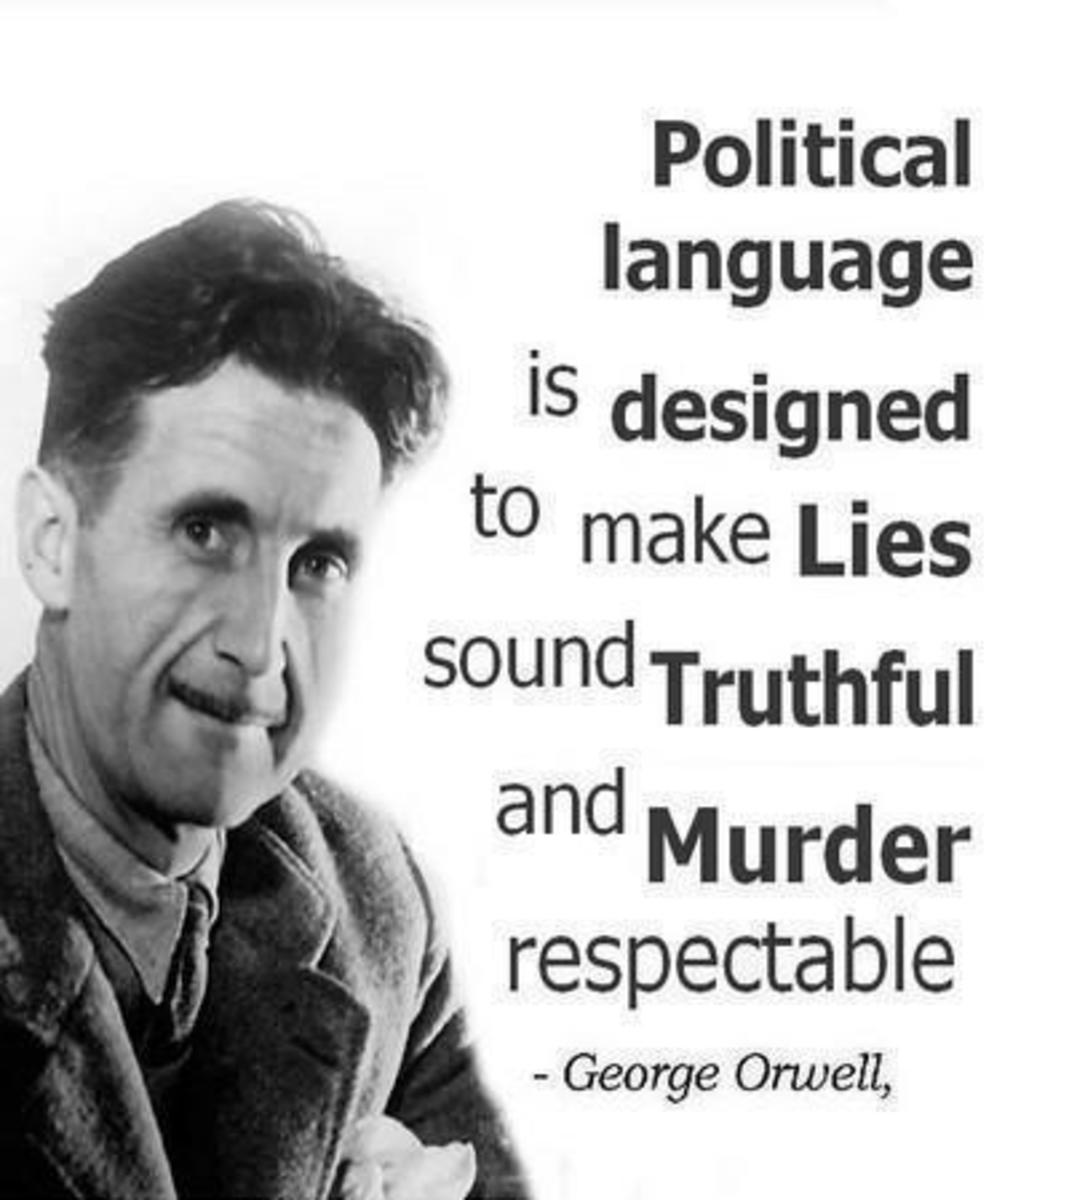 Analyzing Dystopian Fiction How George Orwell\u0027s \u00271984\u0027 and Fritz